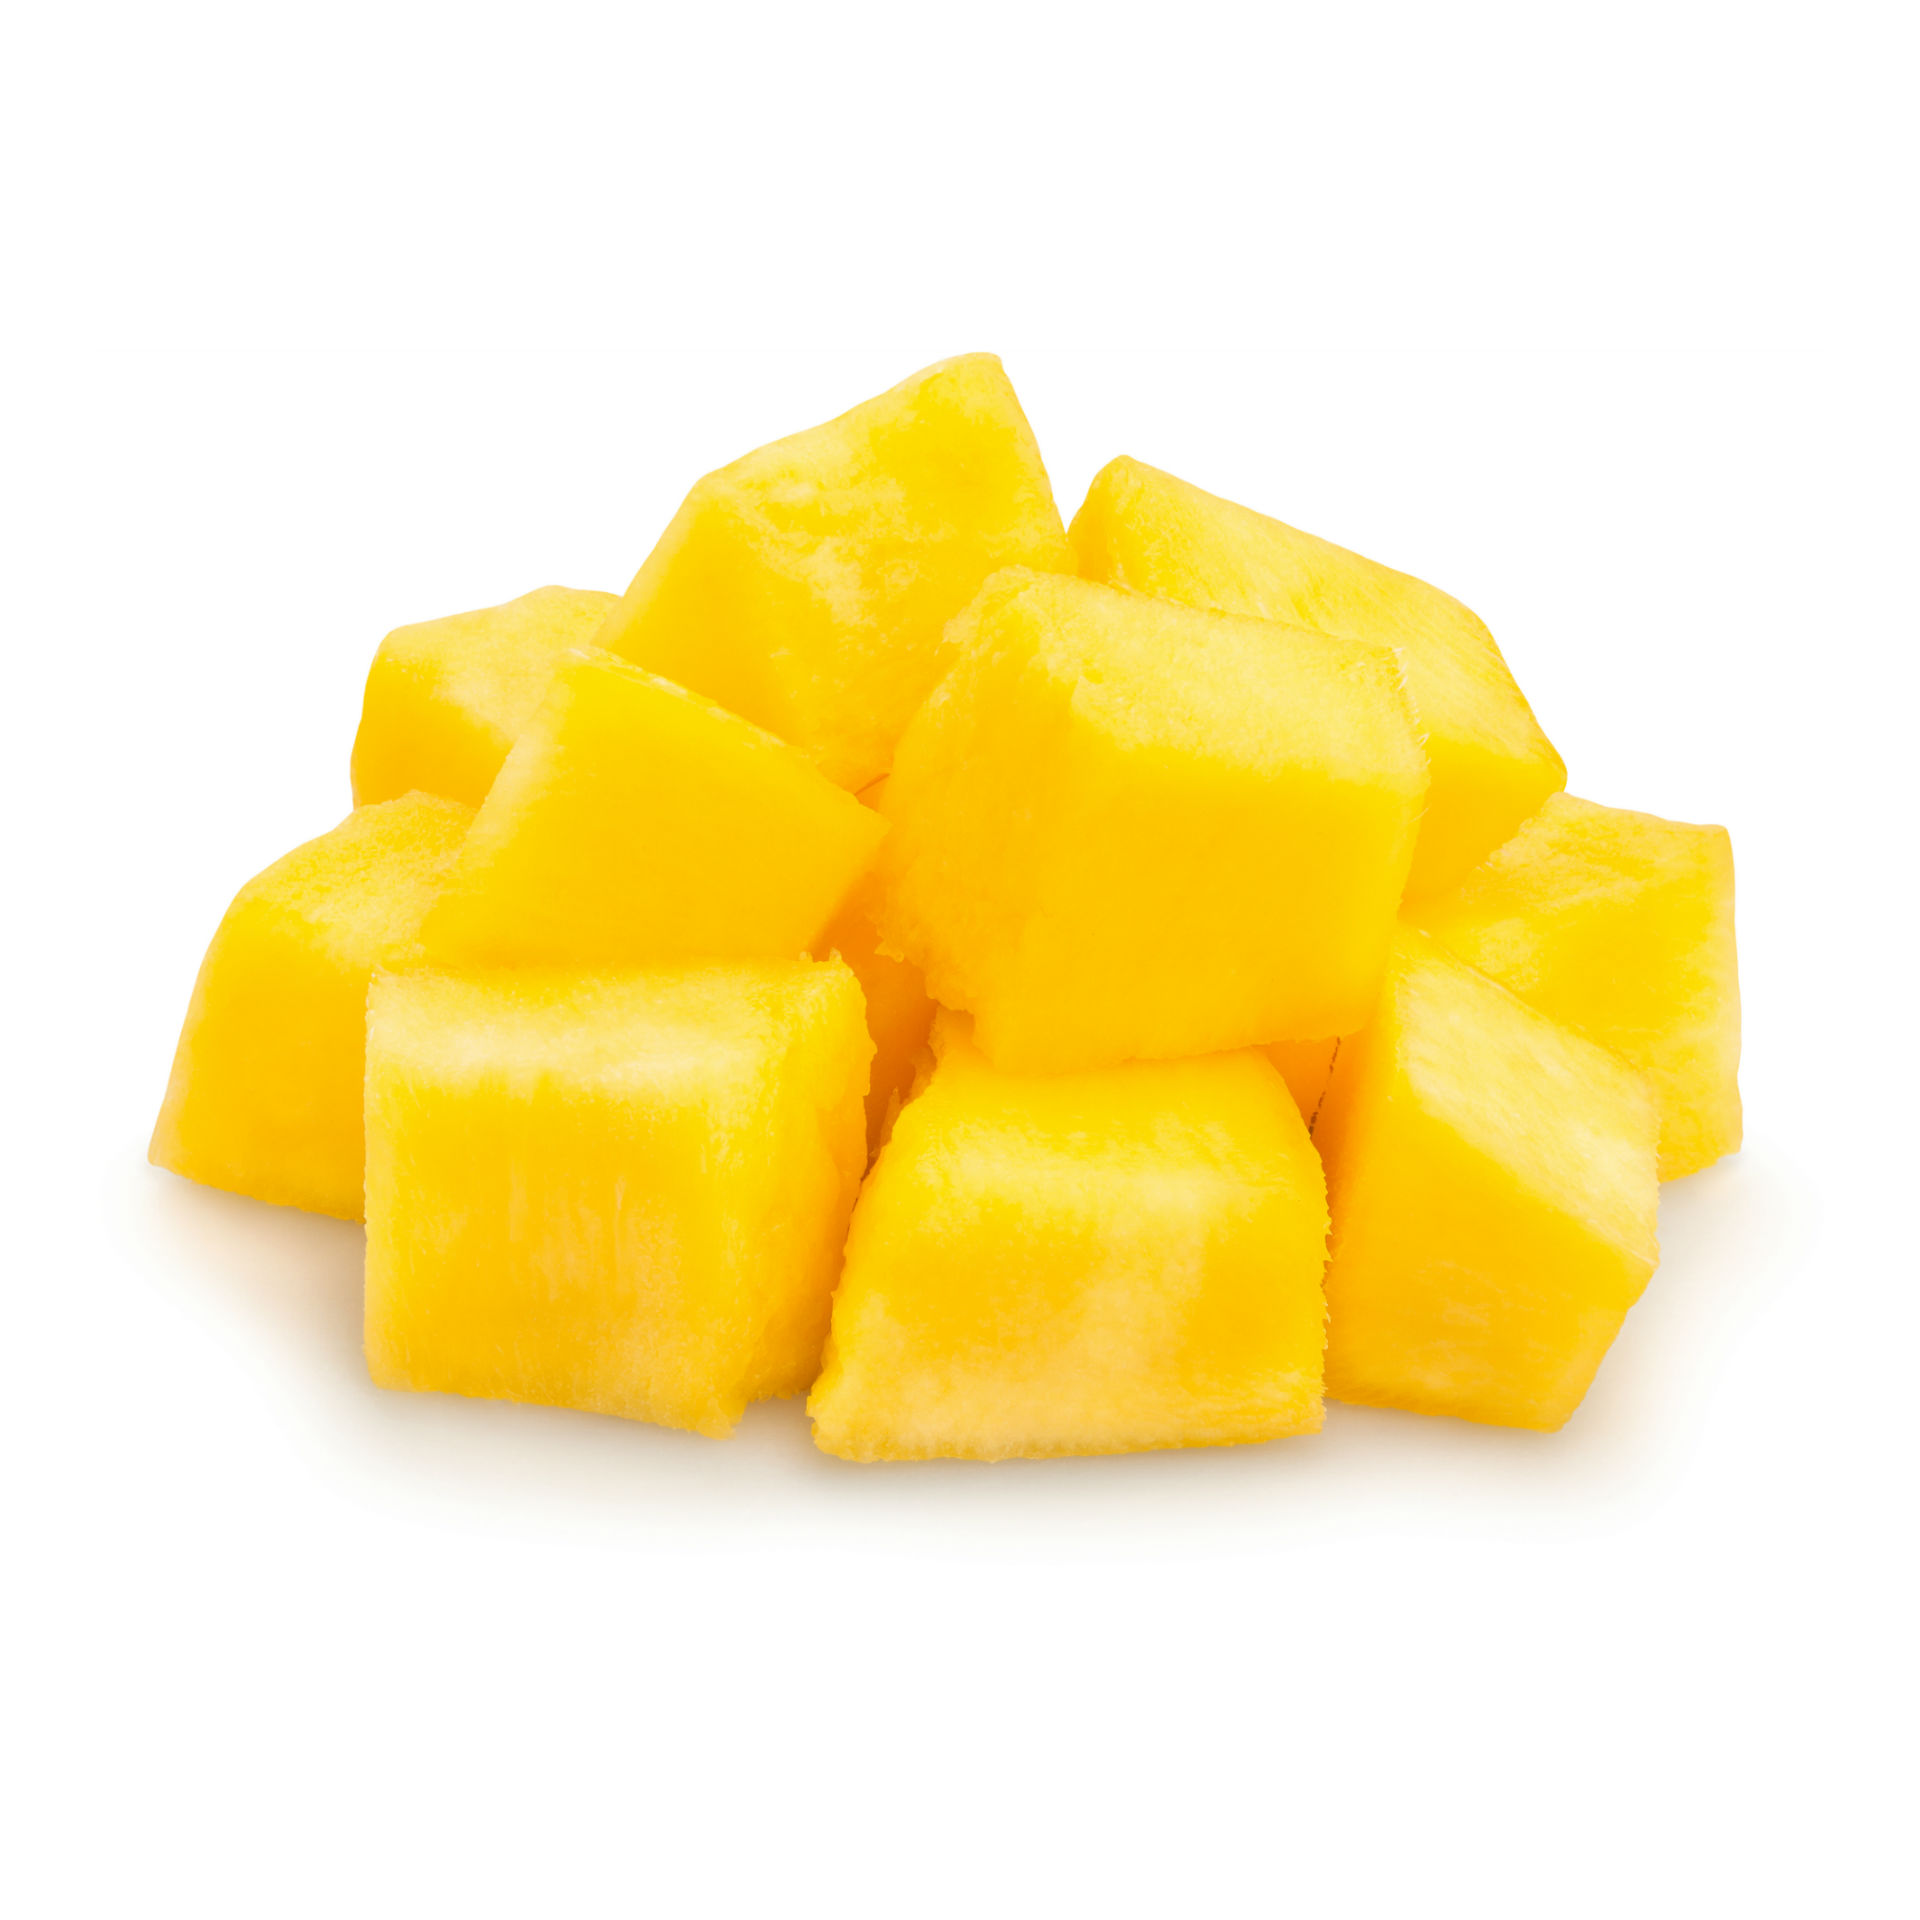 Mangowürfel, tiefgekühlt (4x2.5kg)